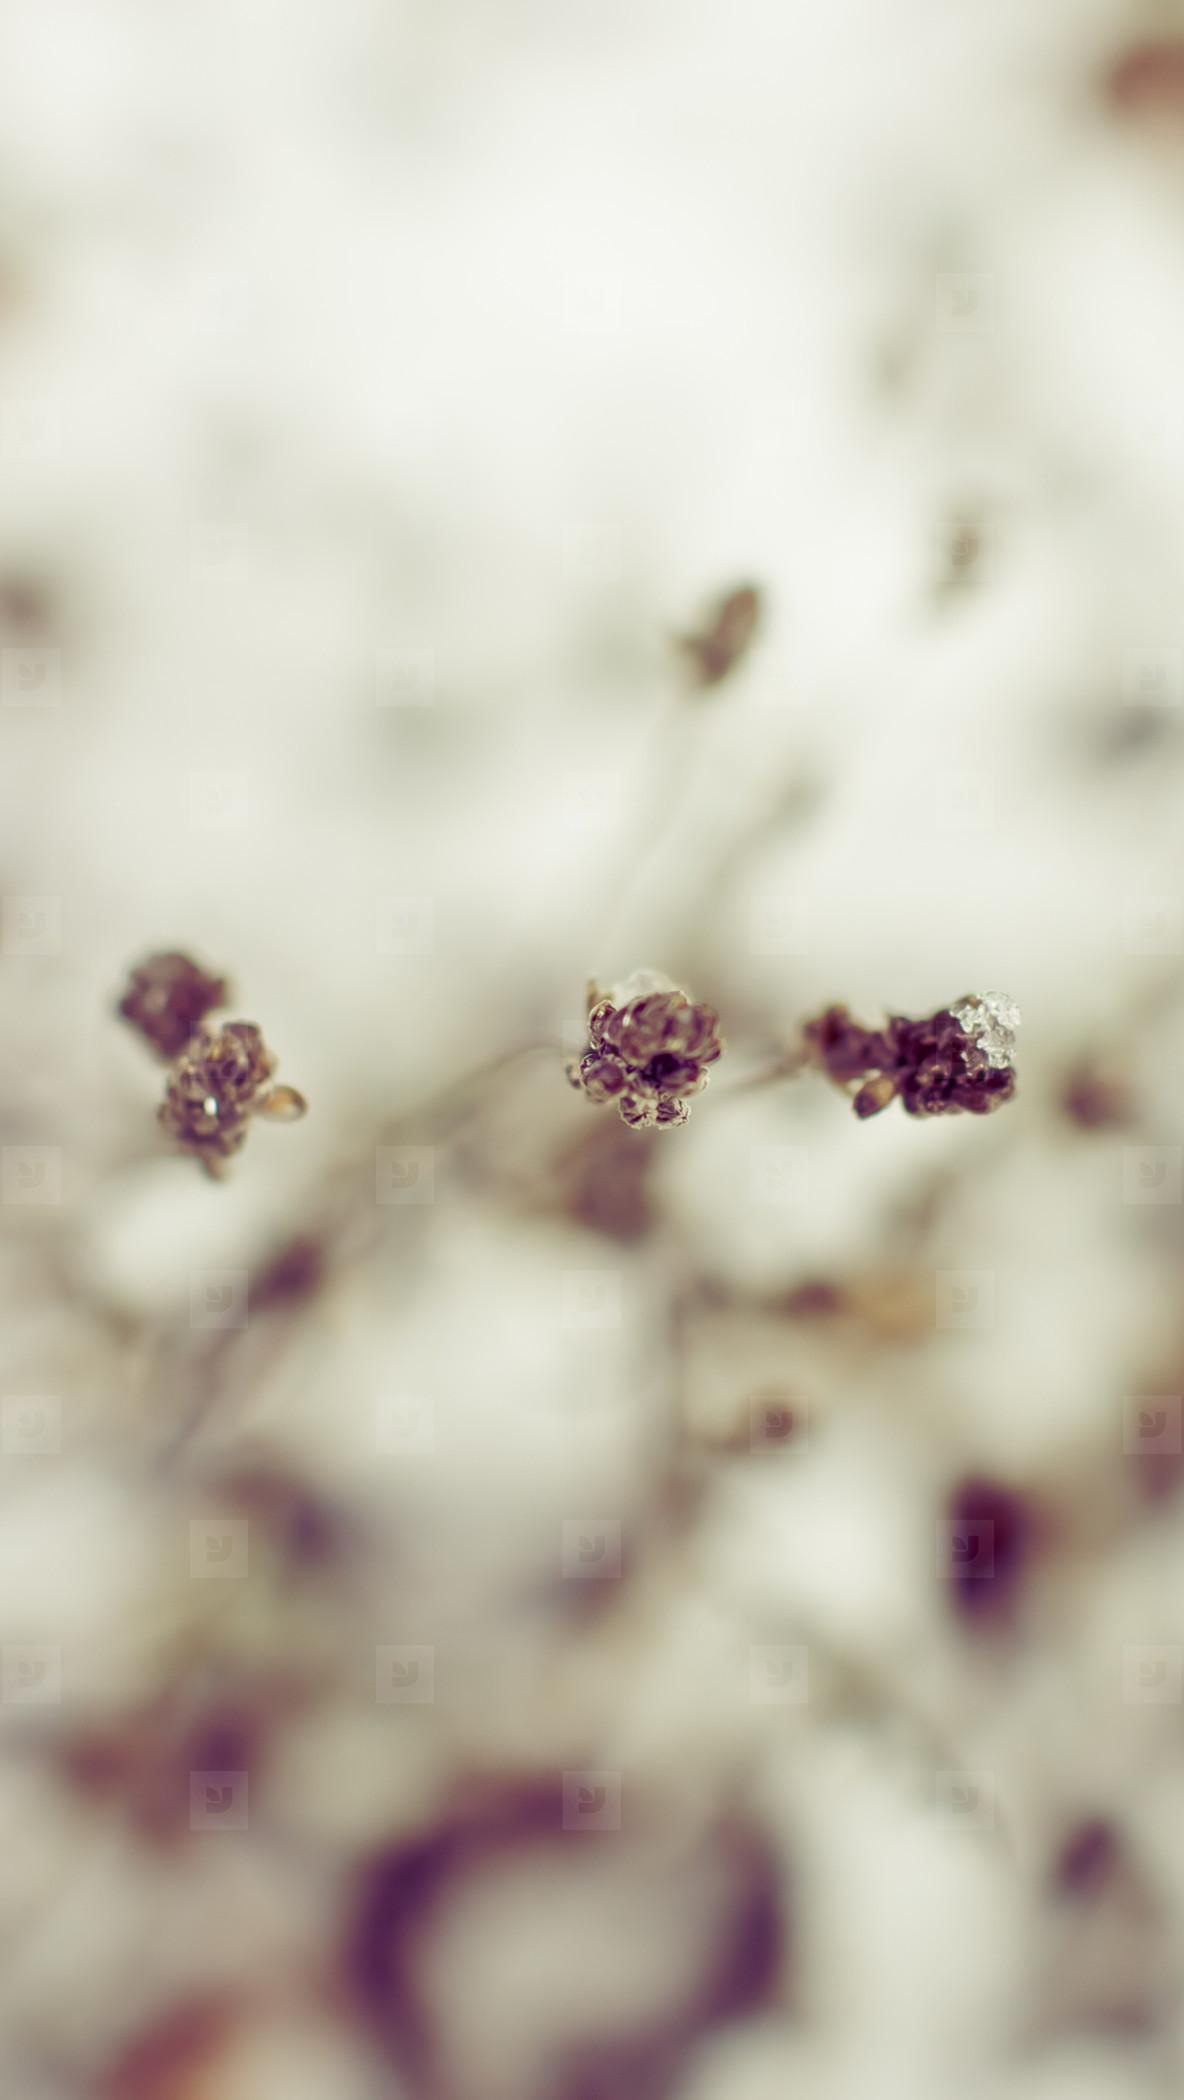 Lavender Plant in Snow